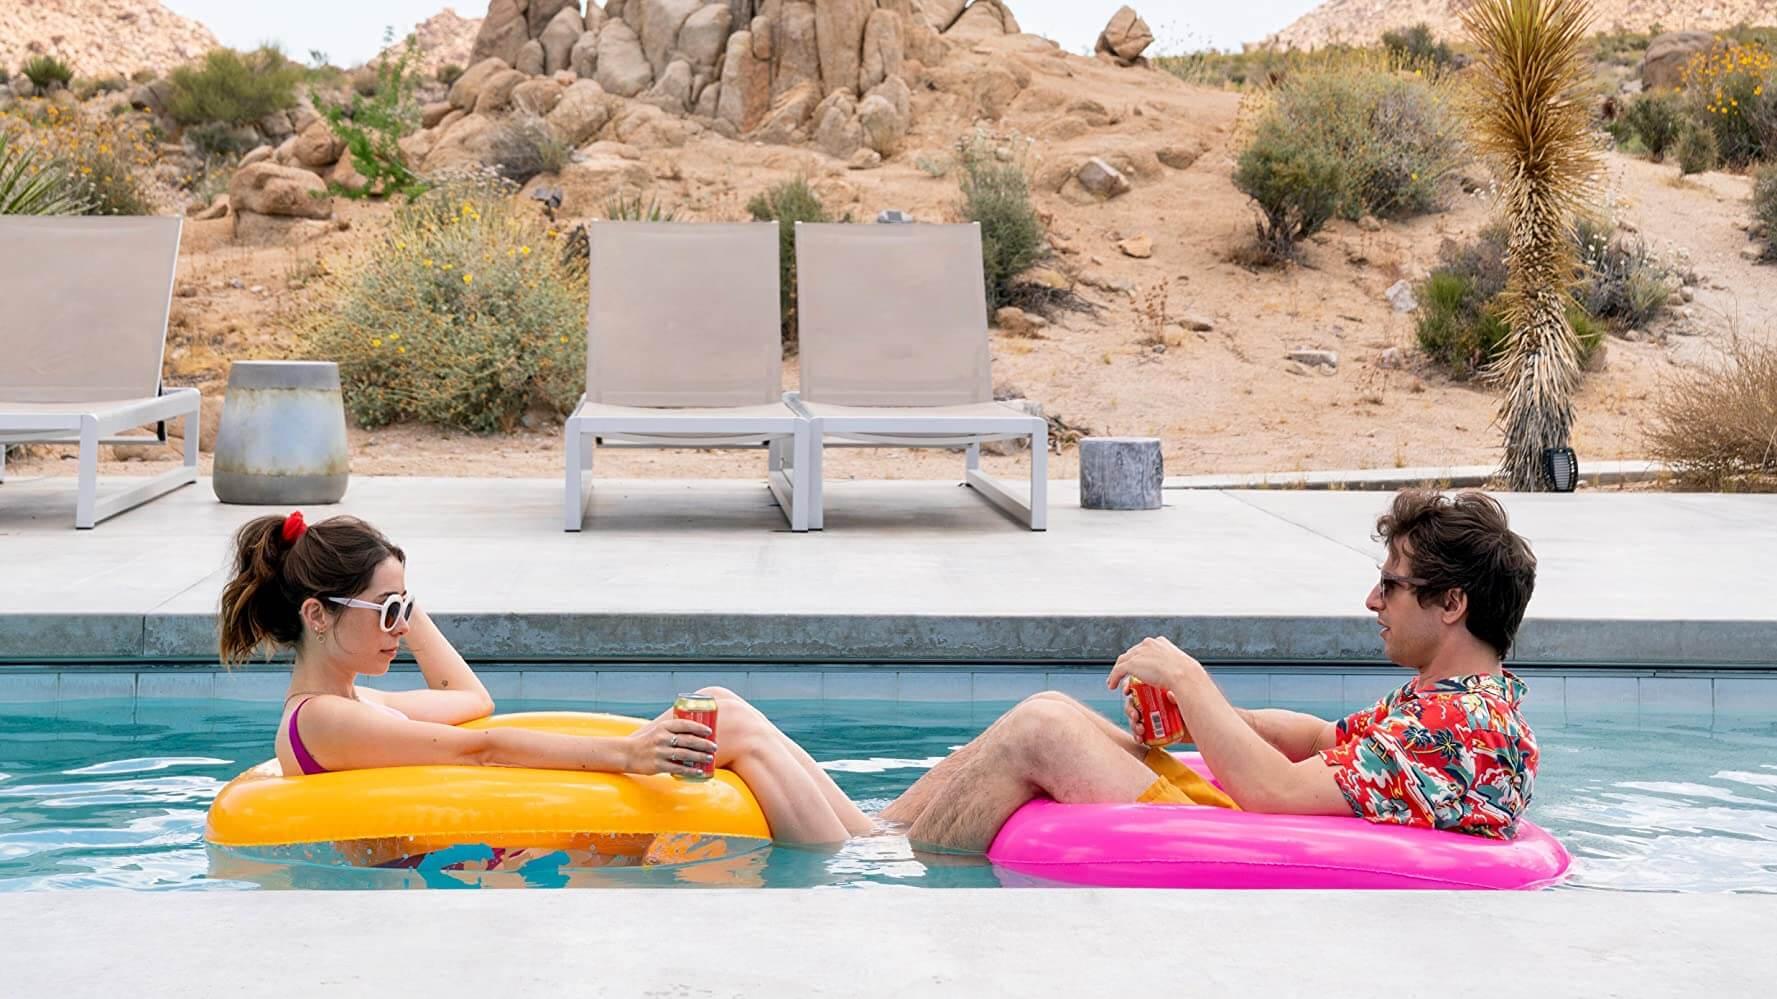 《Palm Springs》安迪山伯格與克莉絲汀米利歐提。